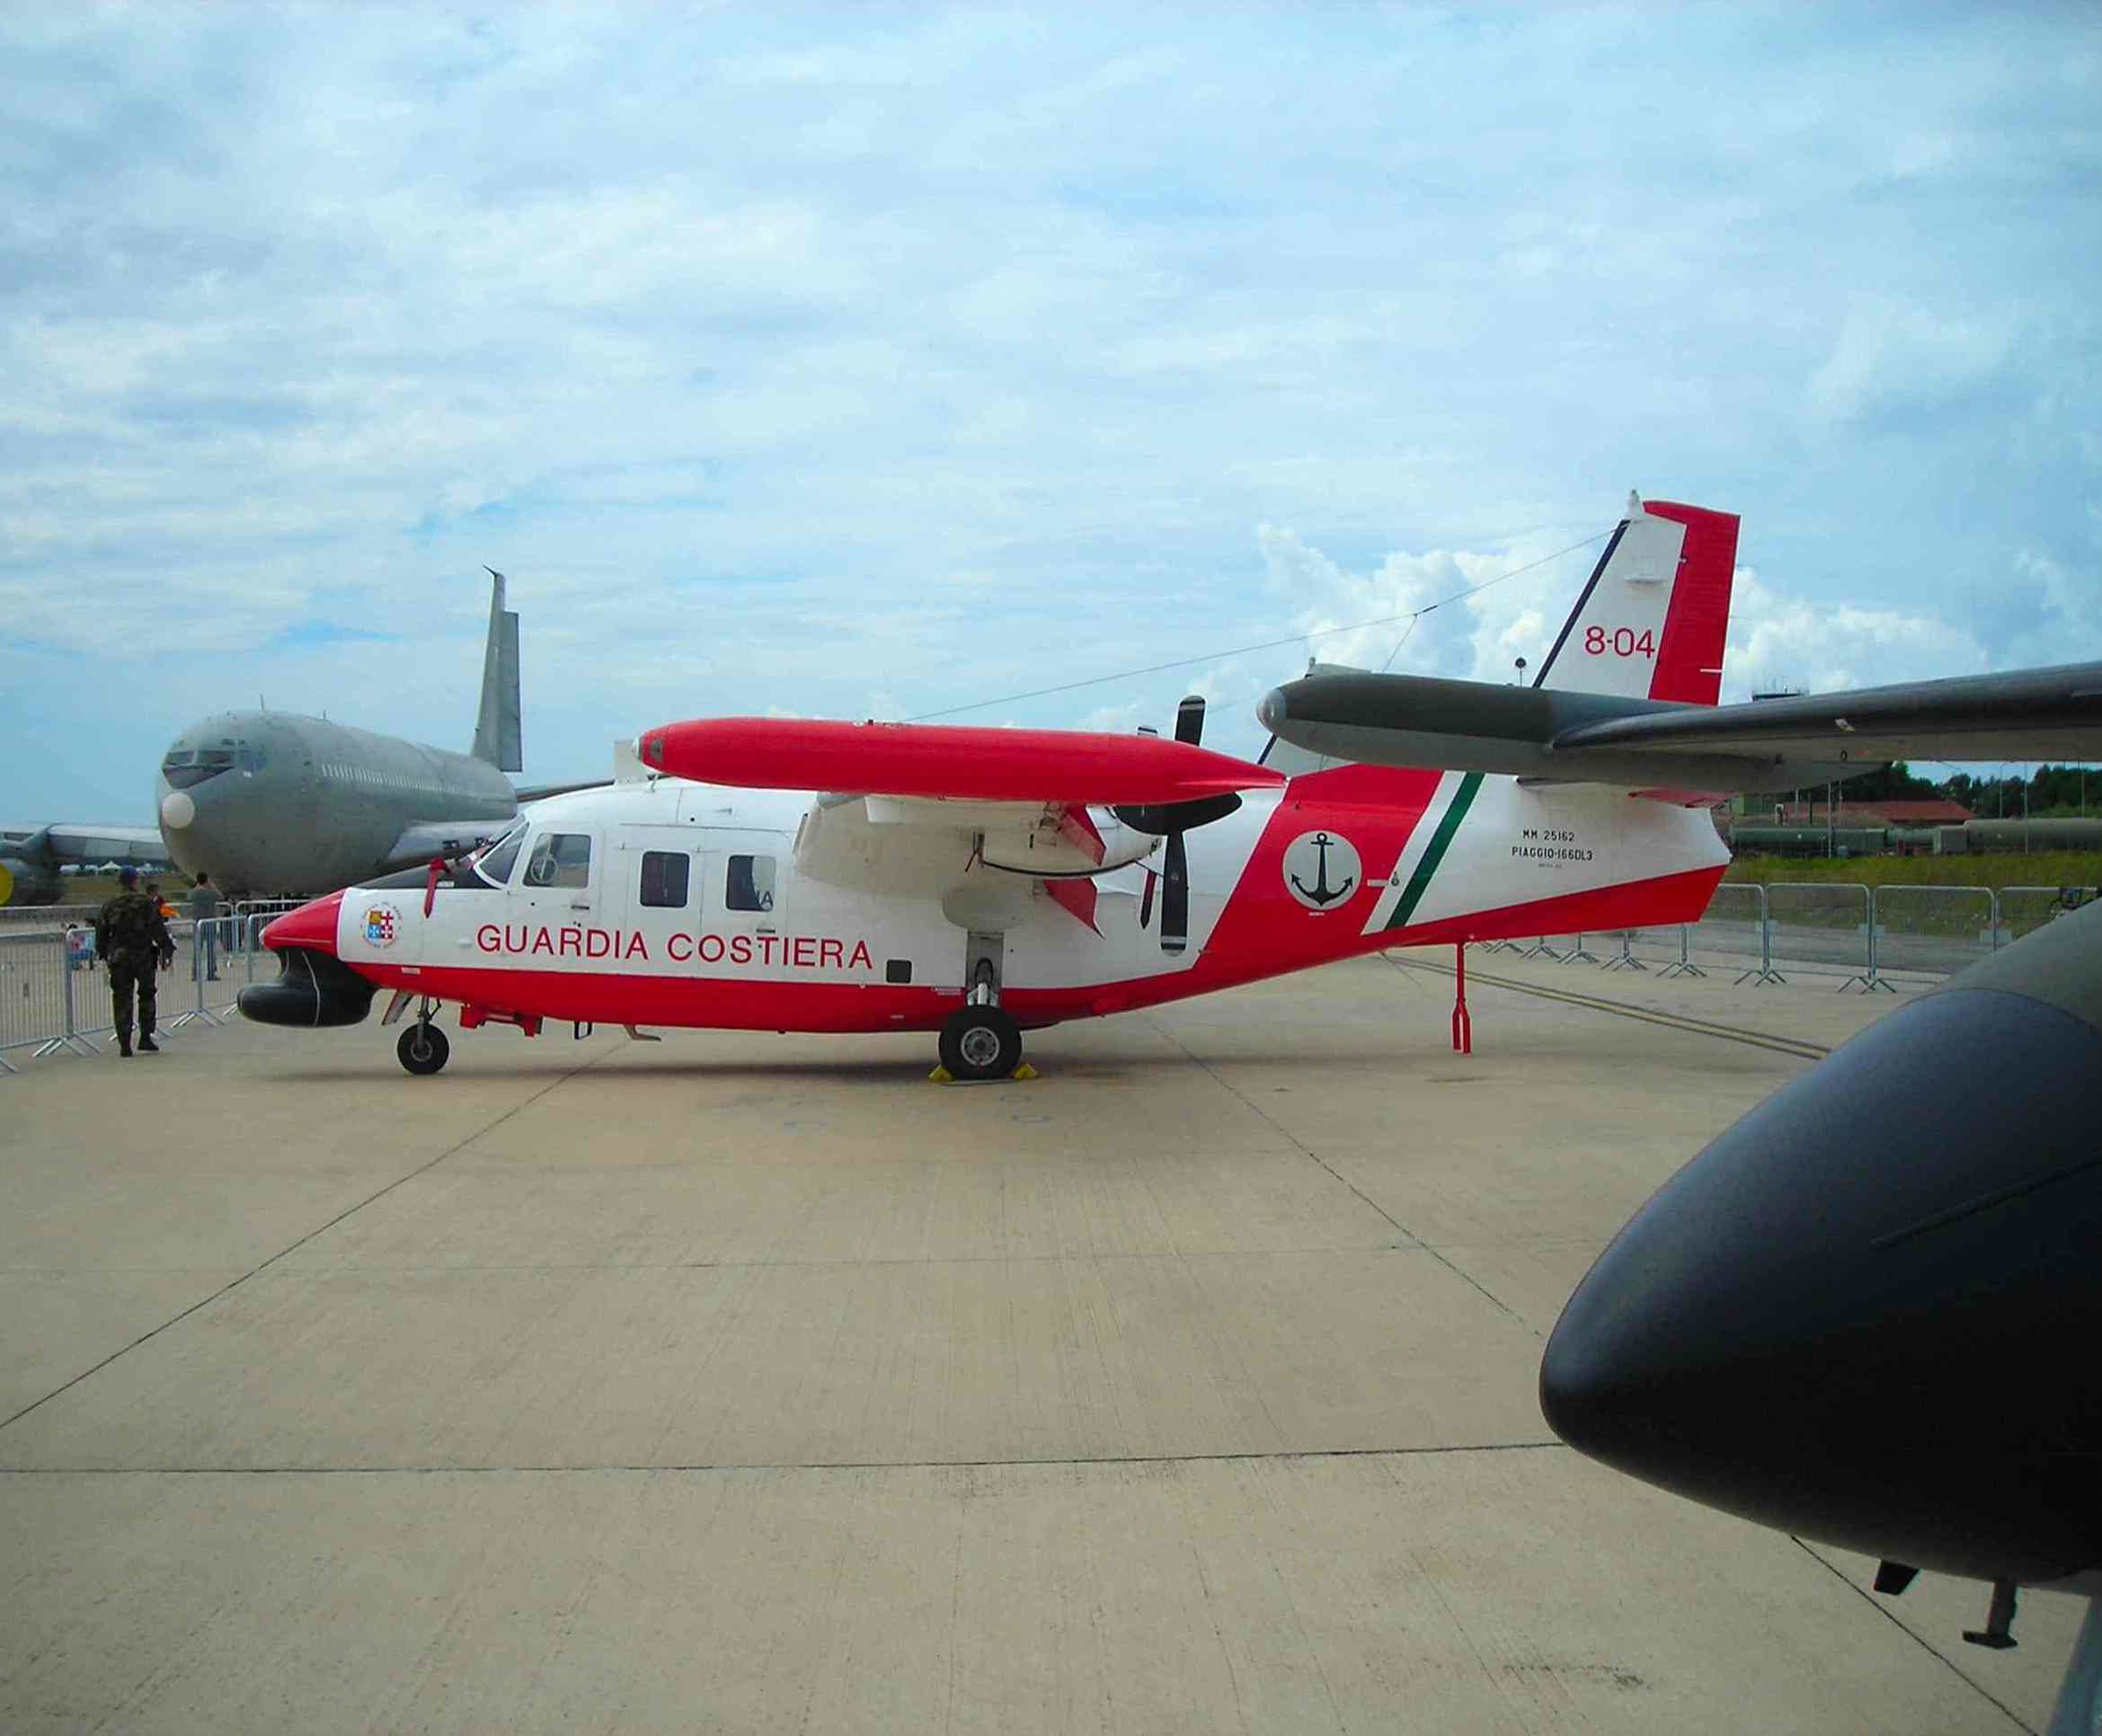 Piaggio P.166 aircraft used by Italian Coast Guard.